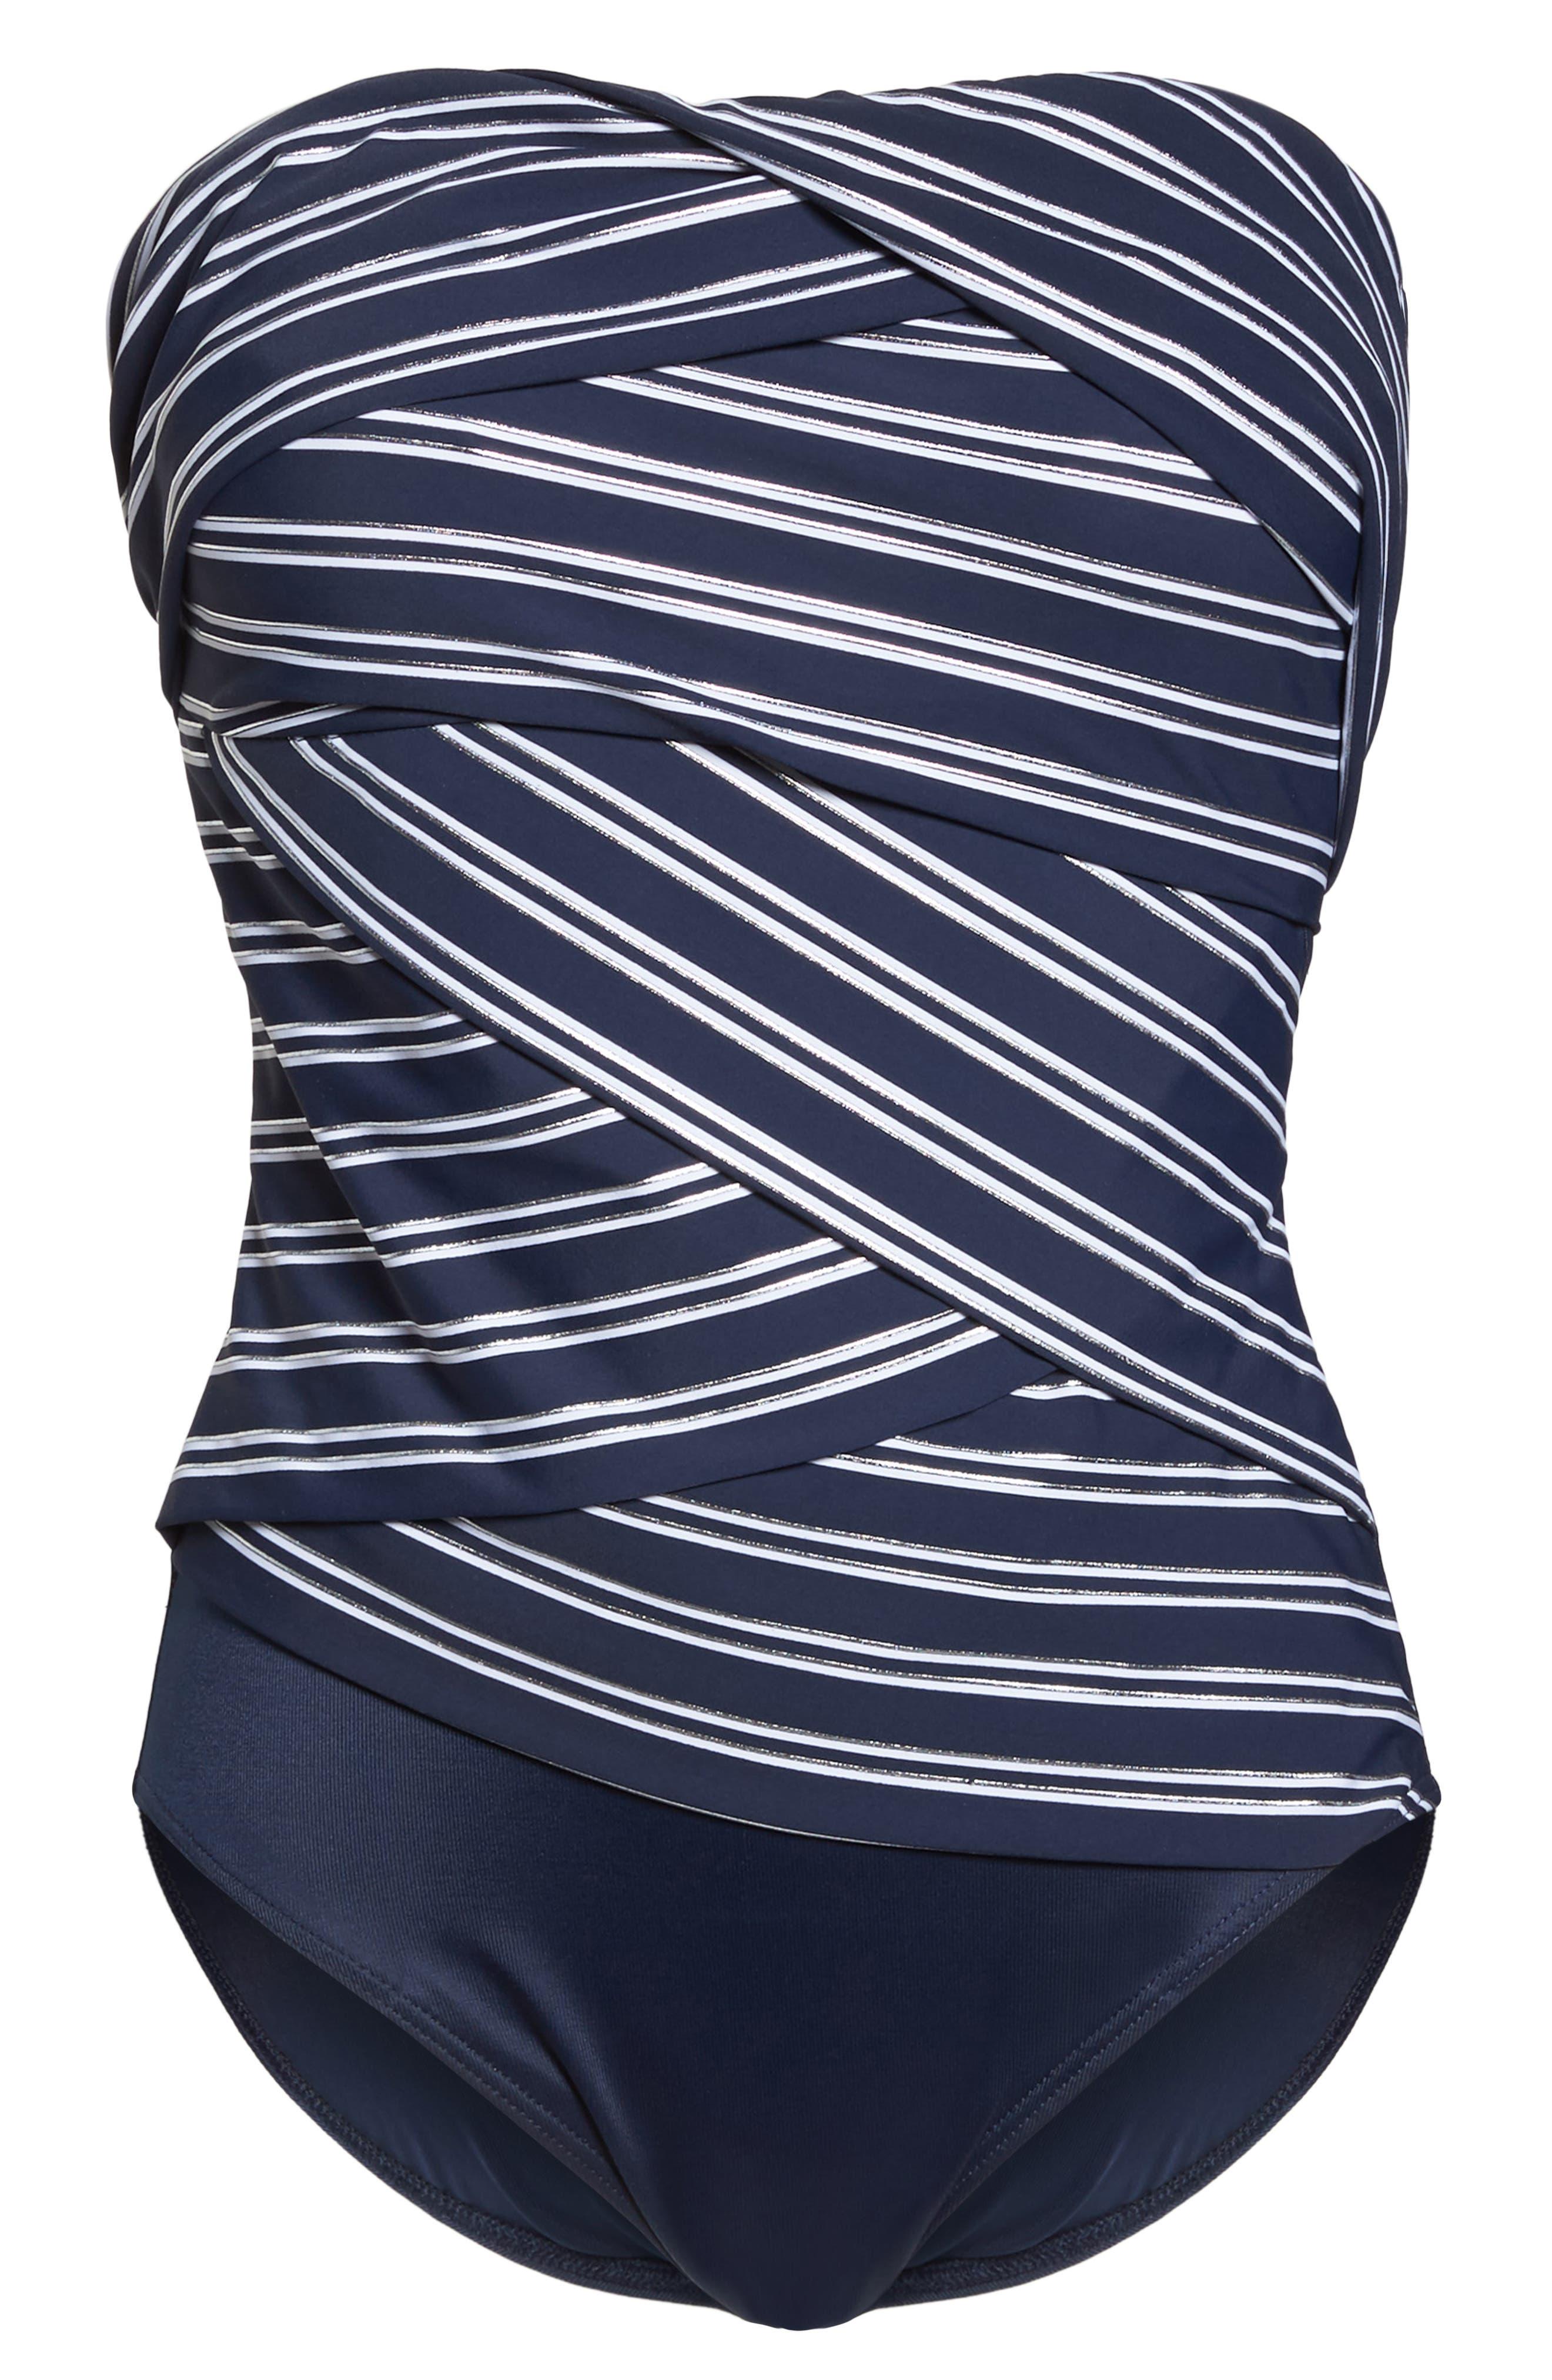 Lanai Stripe Muse Strapless One-Piece Swimsuit,                             Alternate thumbnail 7, color,                             412